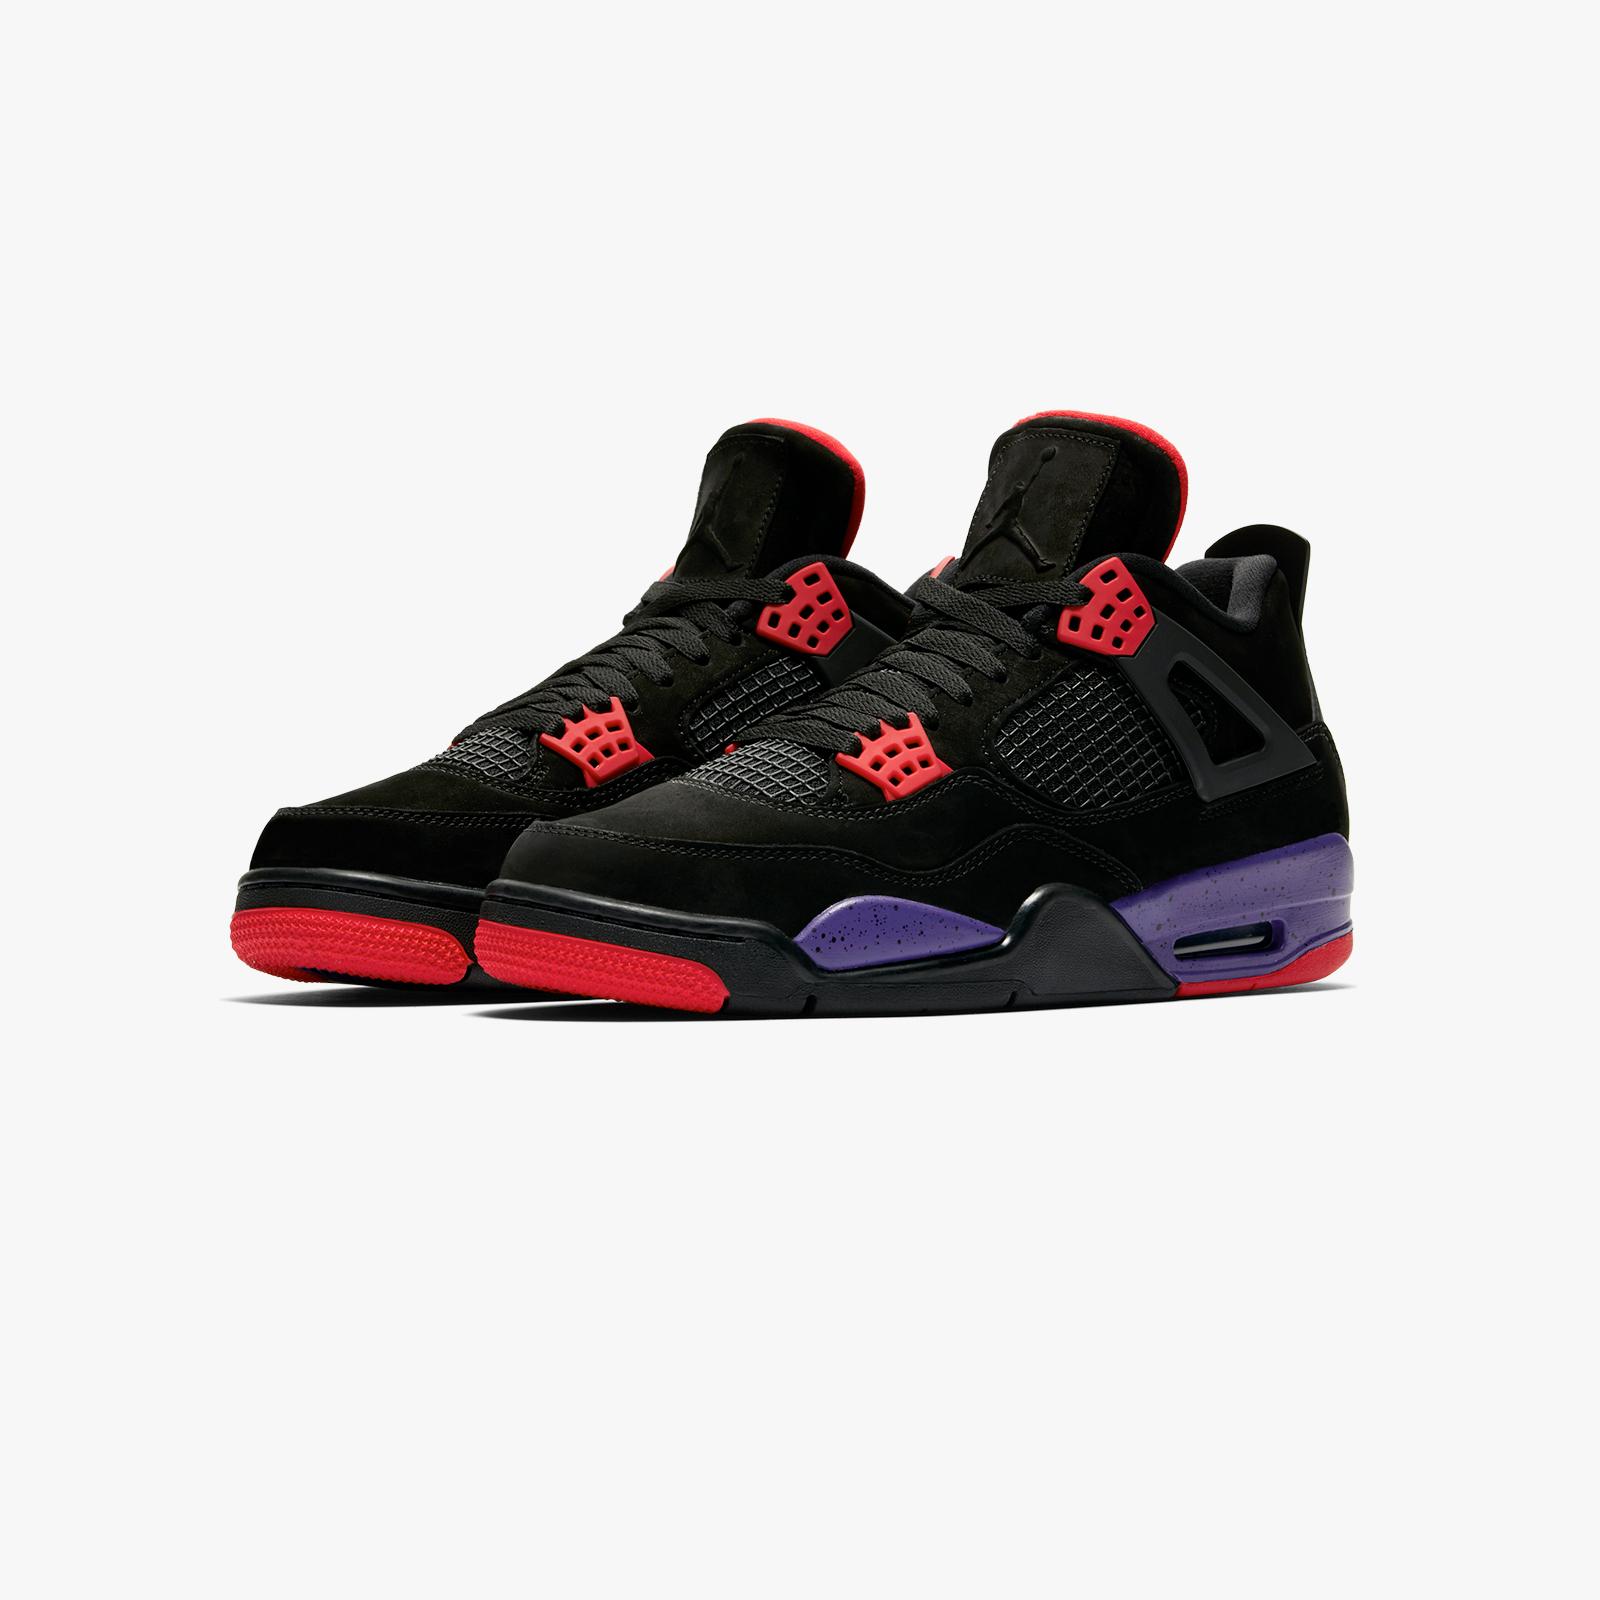 the latest 25a88 d4afe Jordan Brand Air Jordan 4 Retro NRG - Aq3816-065 - Sneakersnstuff    sneakers   streetwear online since 1999